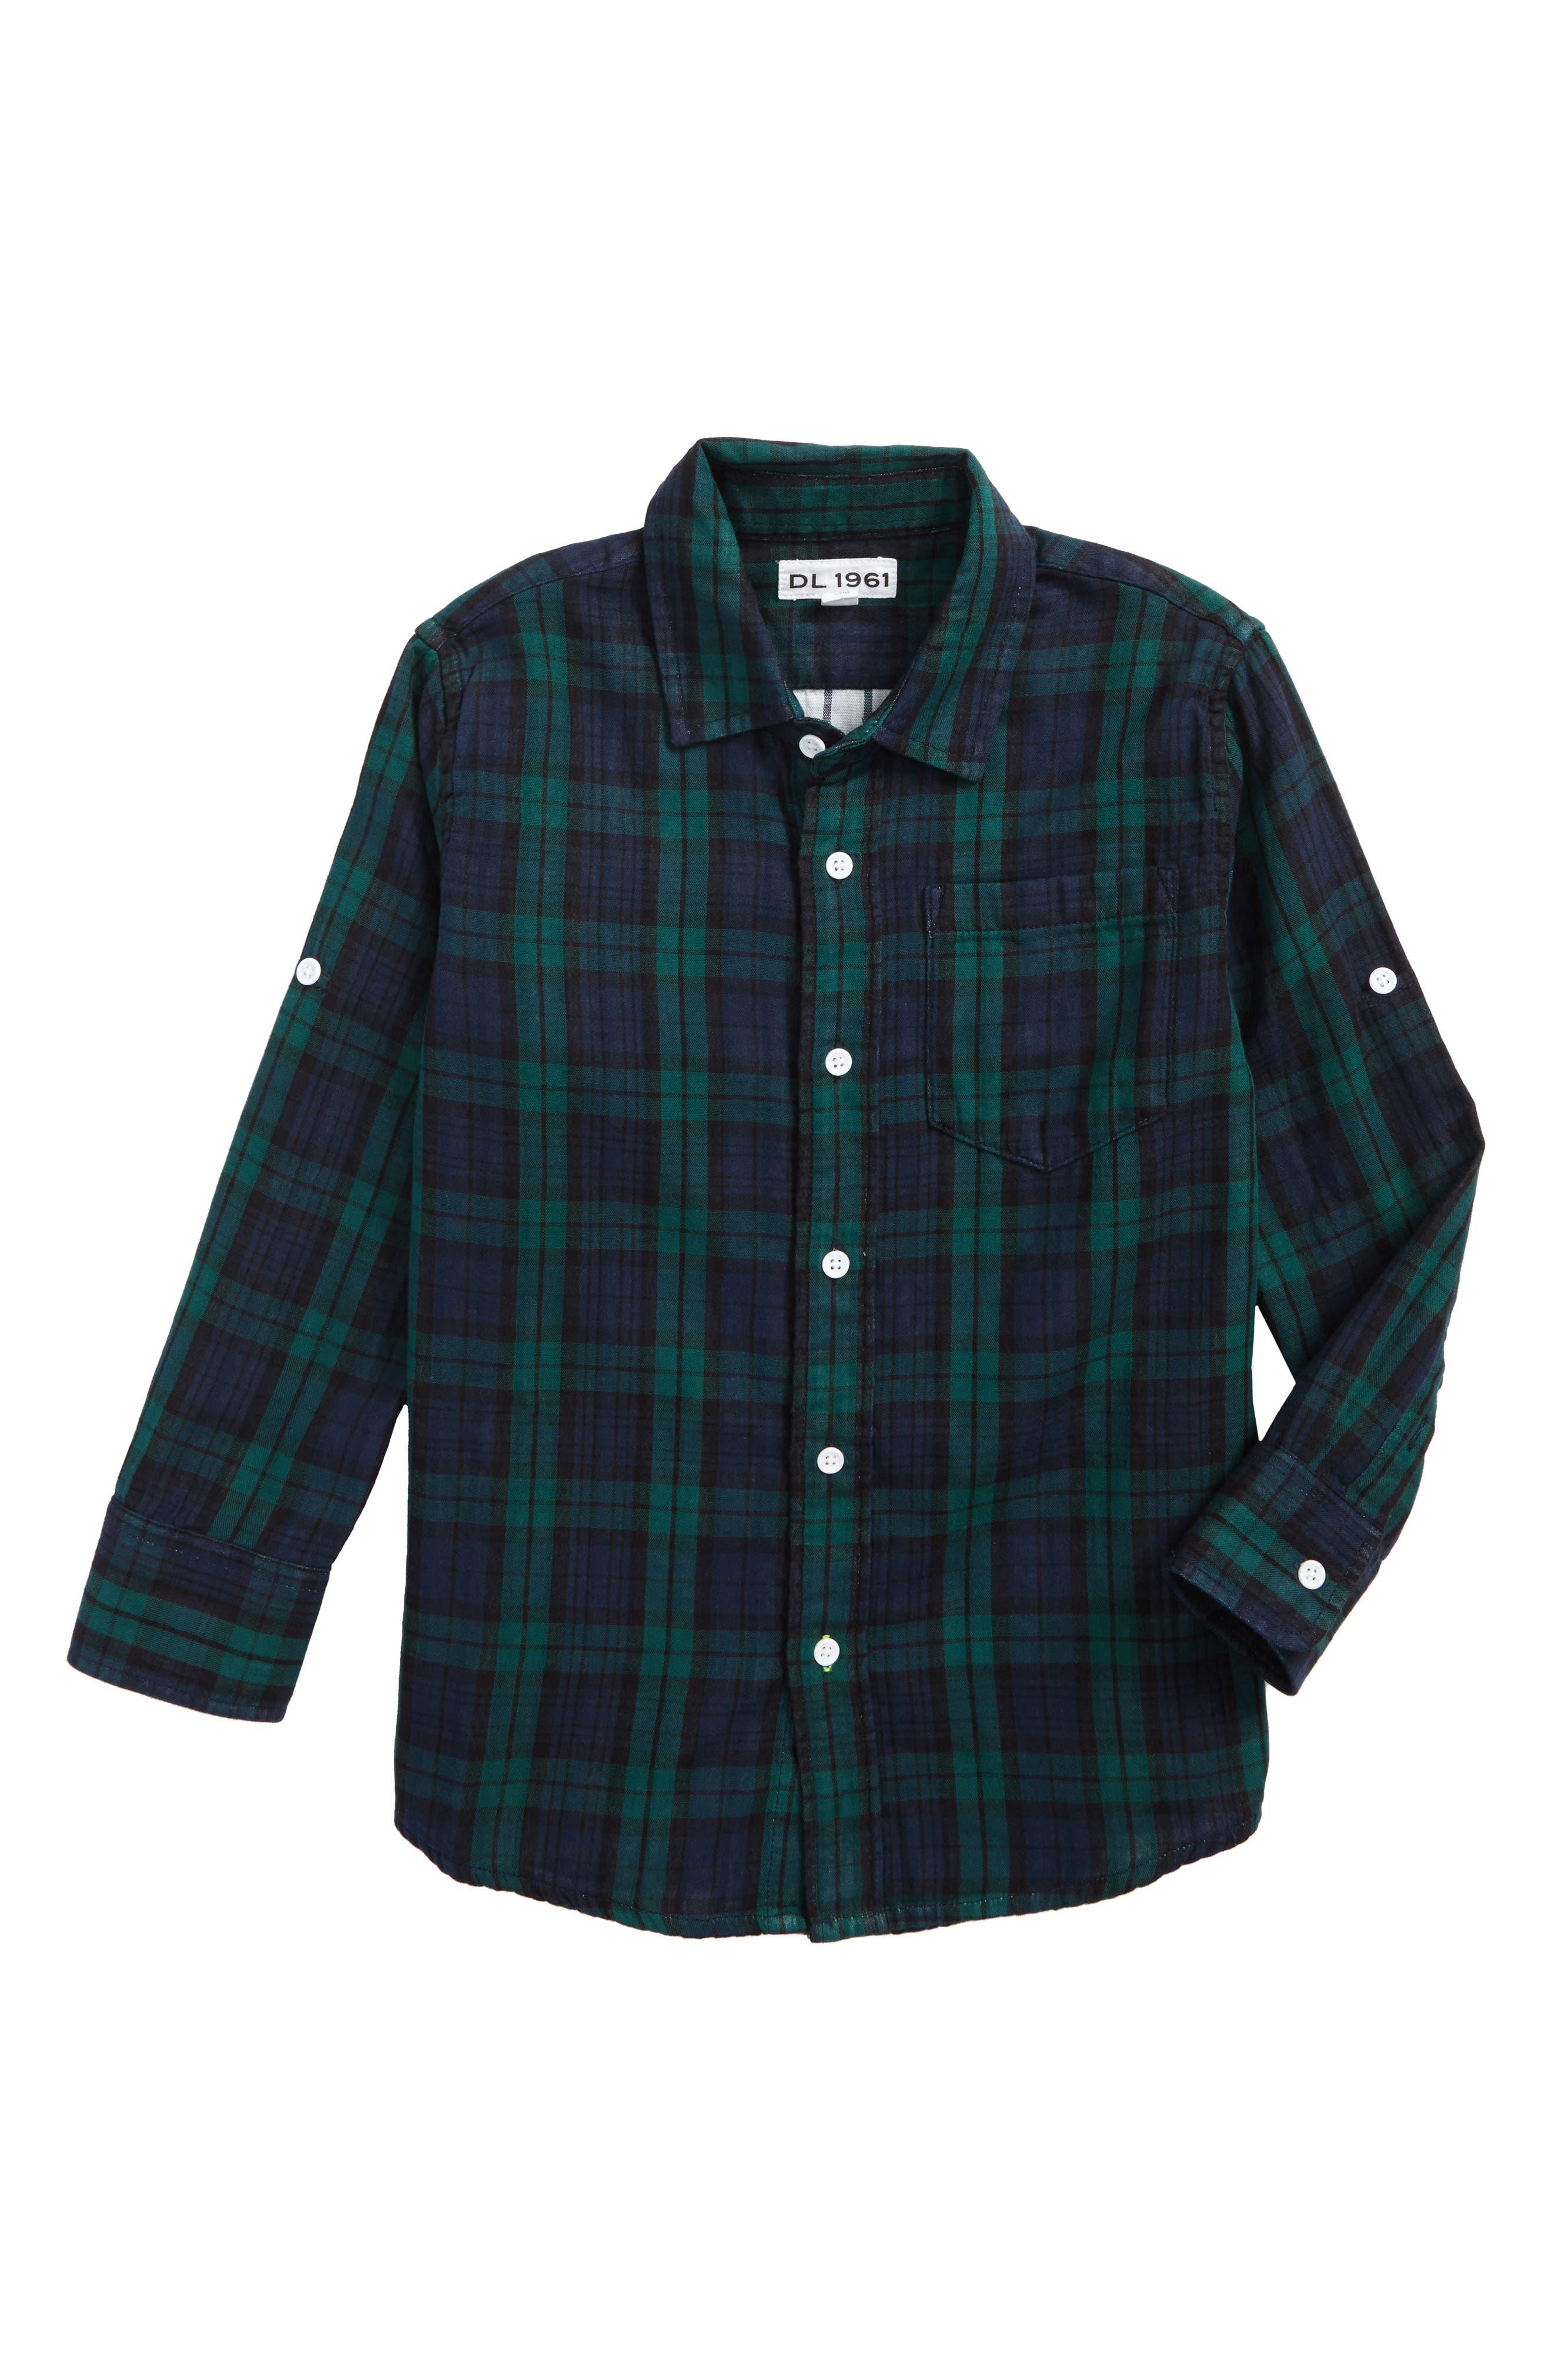 Plaid Woven Shirt,                             Main thumbnail 1, color,                             Green Double Faced Plaid